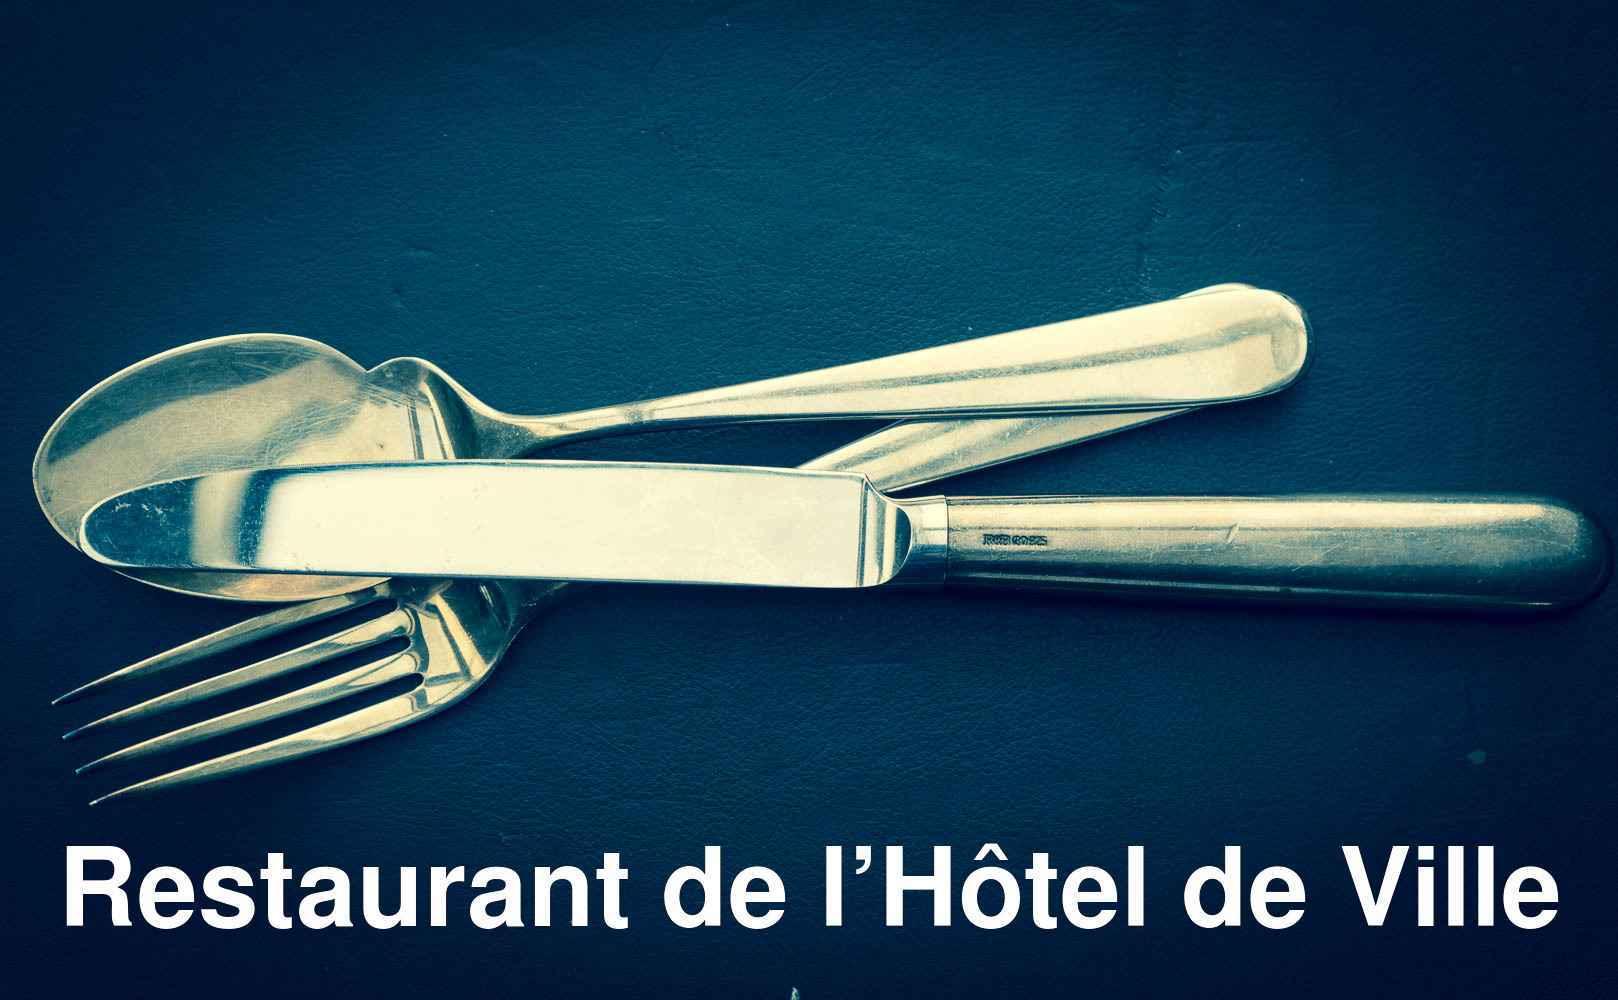 Restaurantkritik: Restaurant de l'Hôtel de Ville in 1023 Crissier, Schweiz